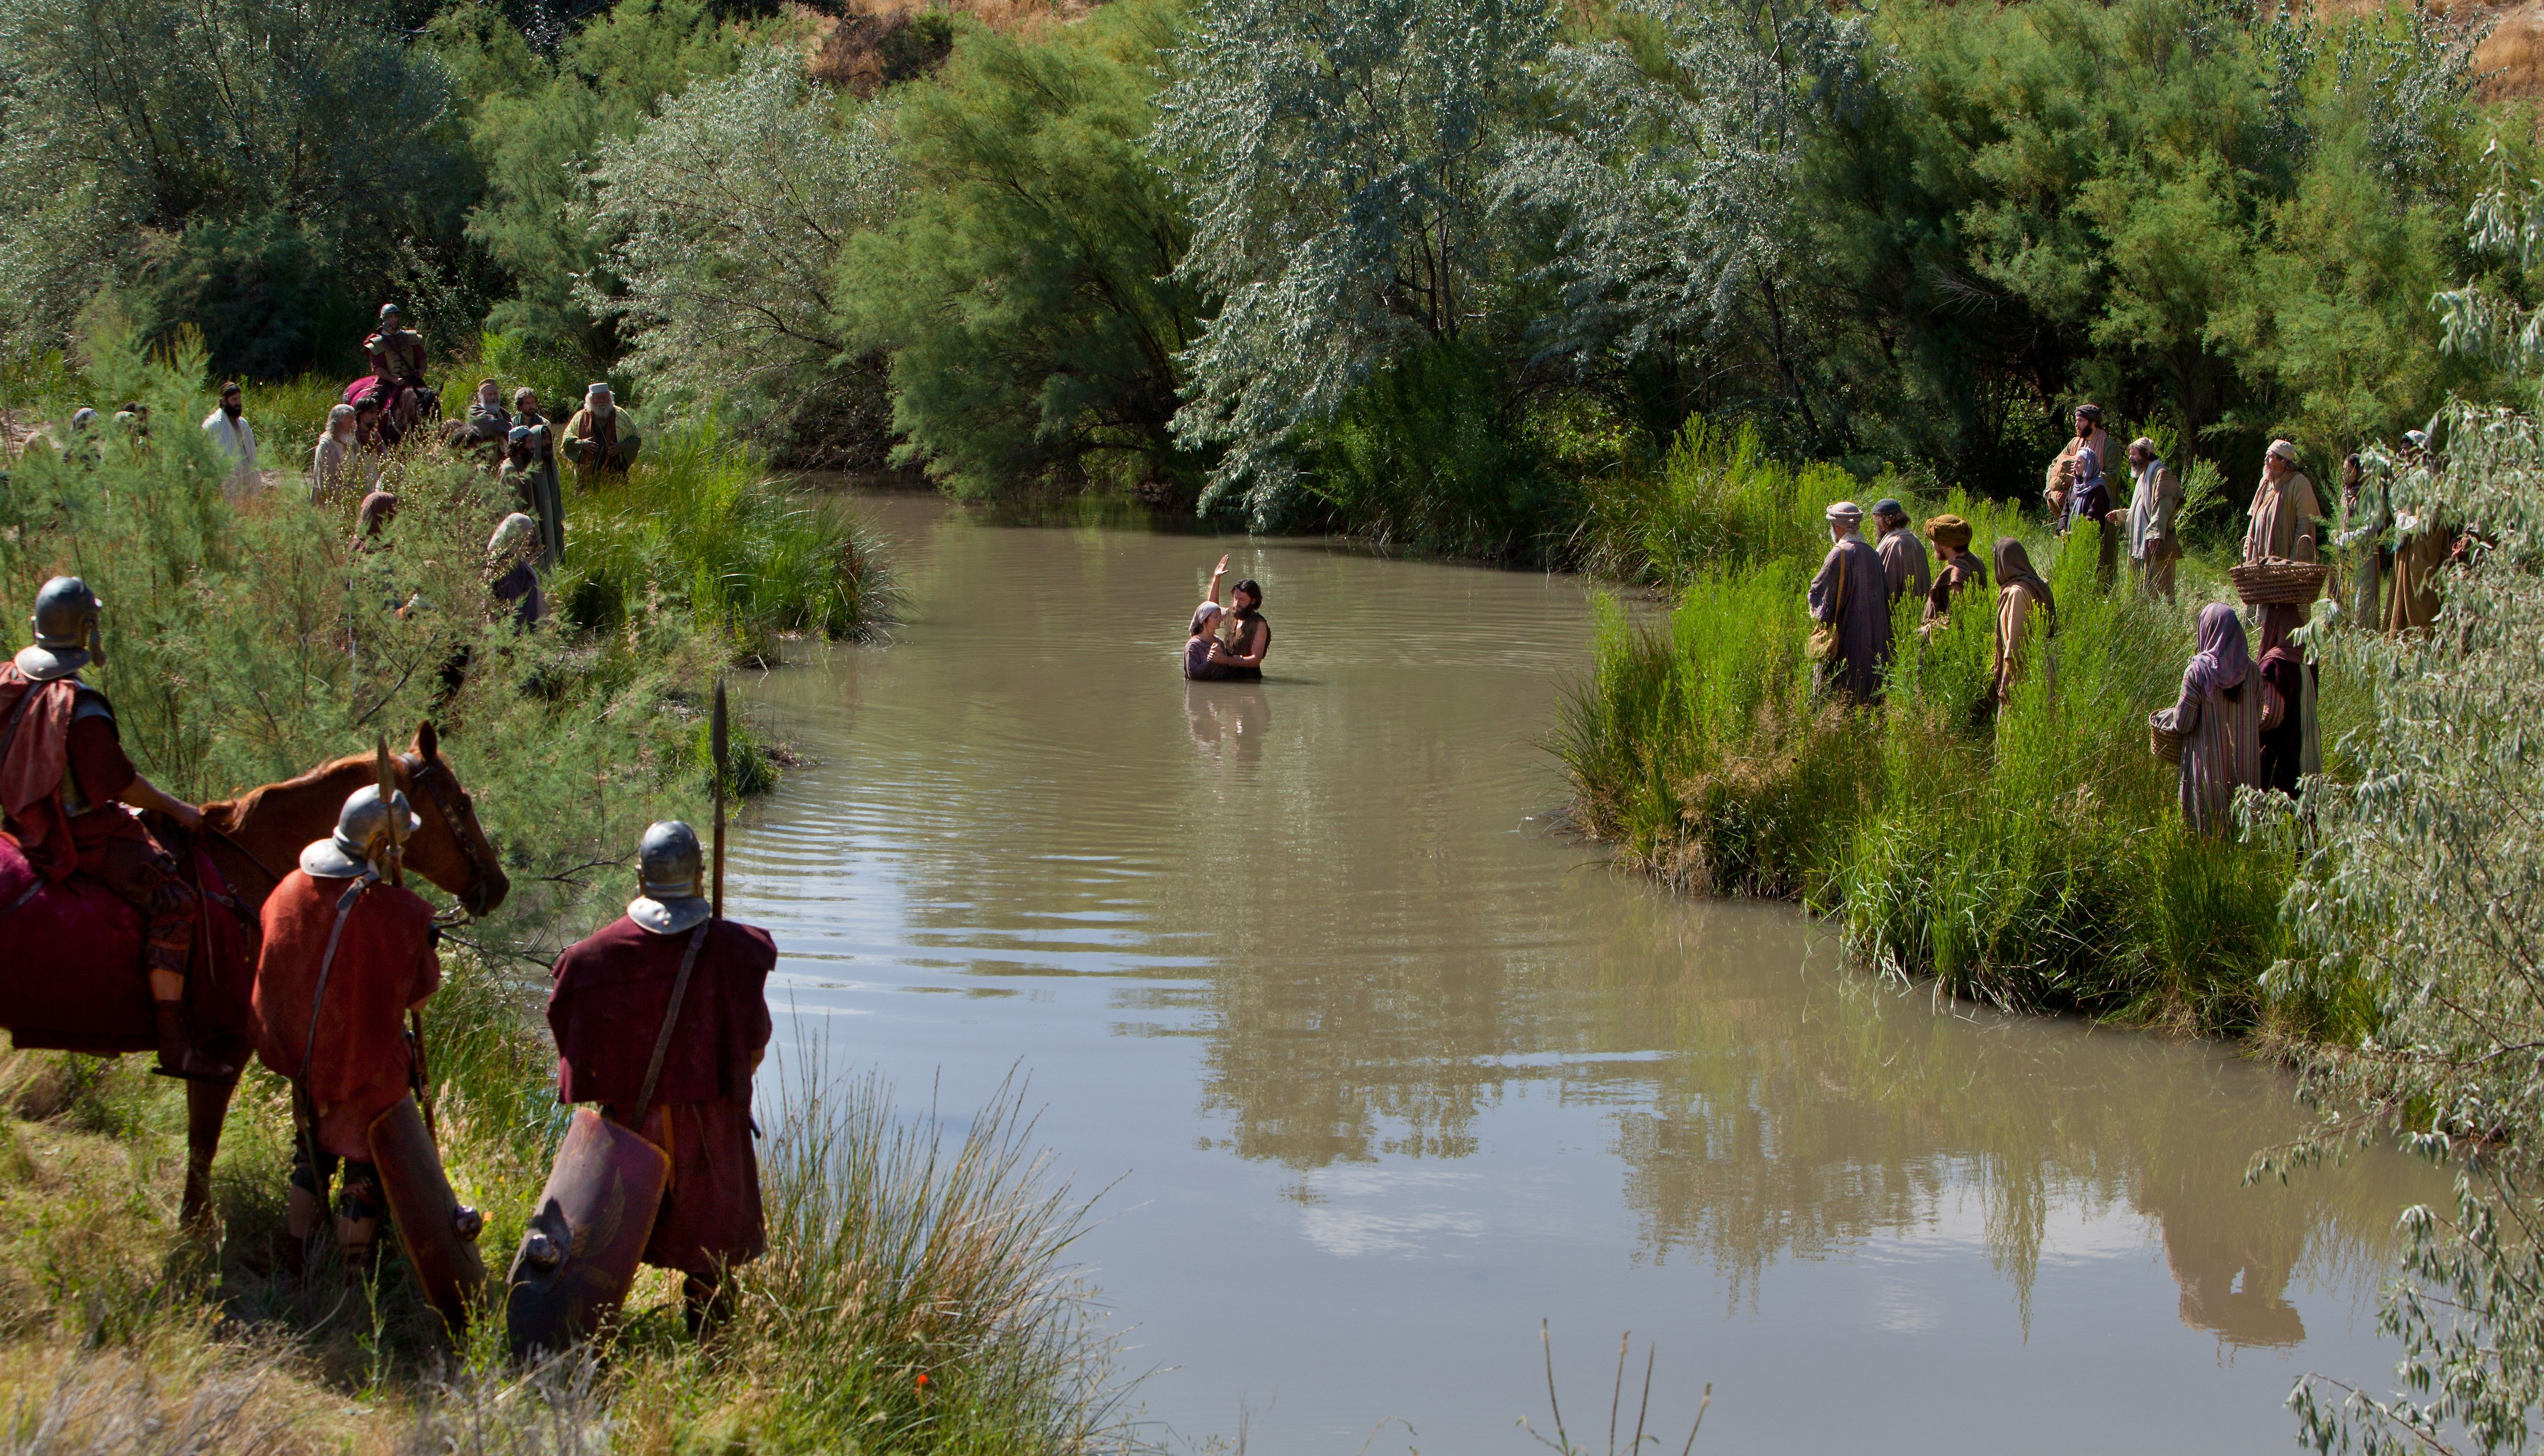 John baptizes men and women in the River Jordan.